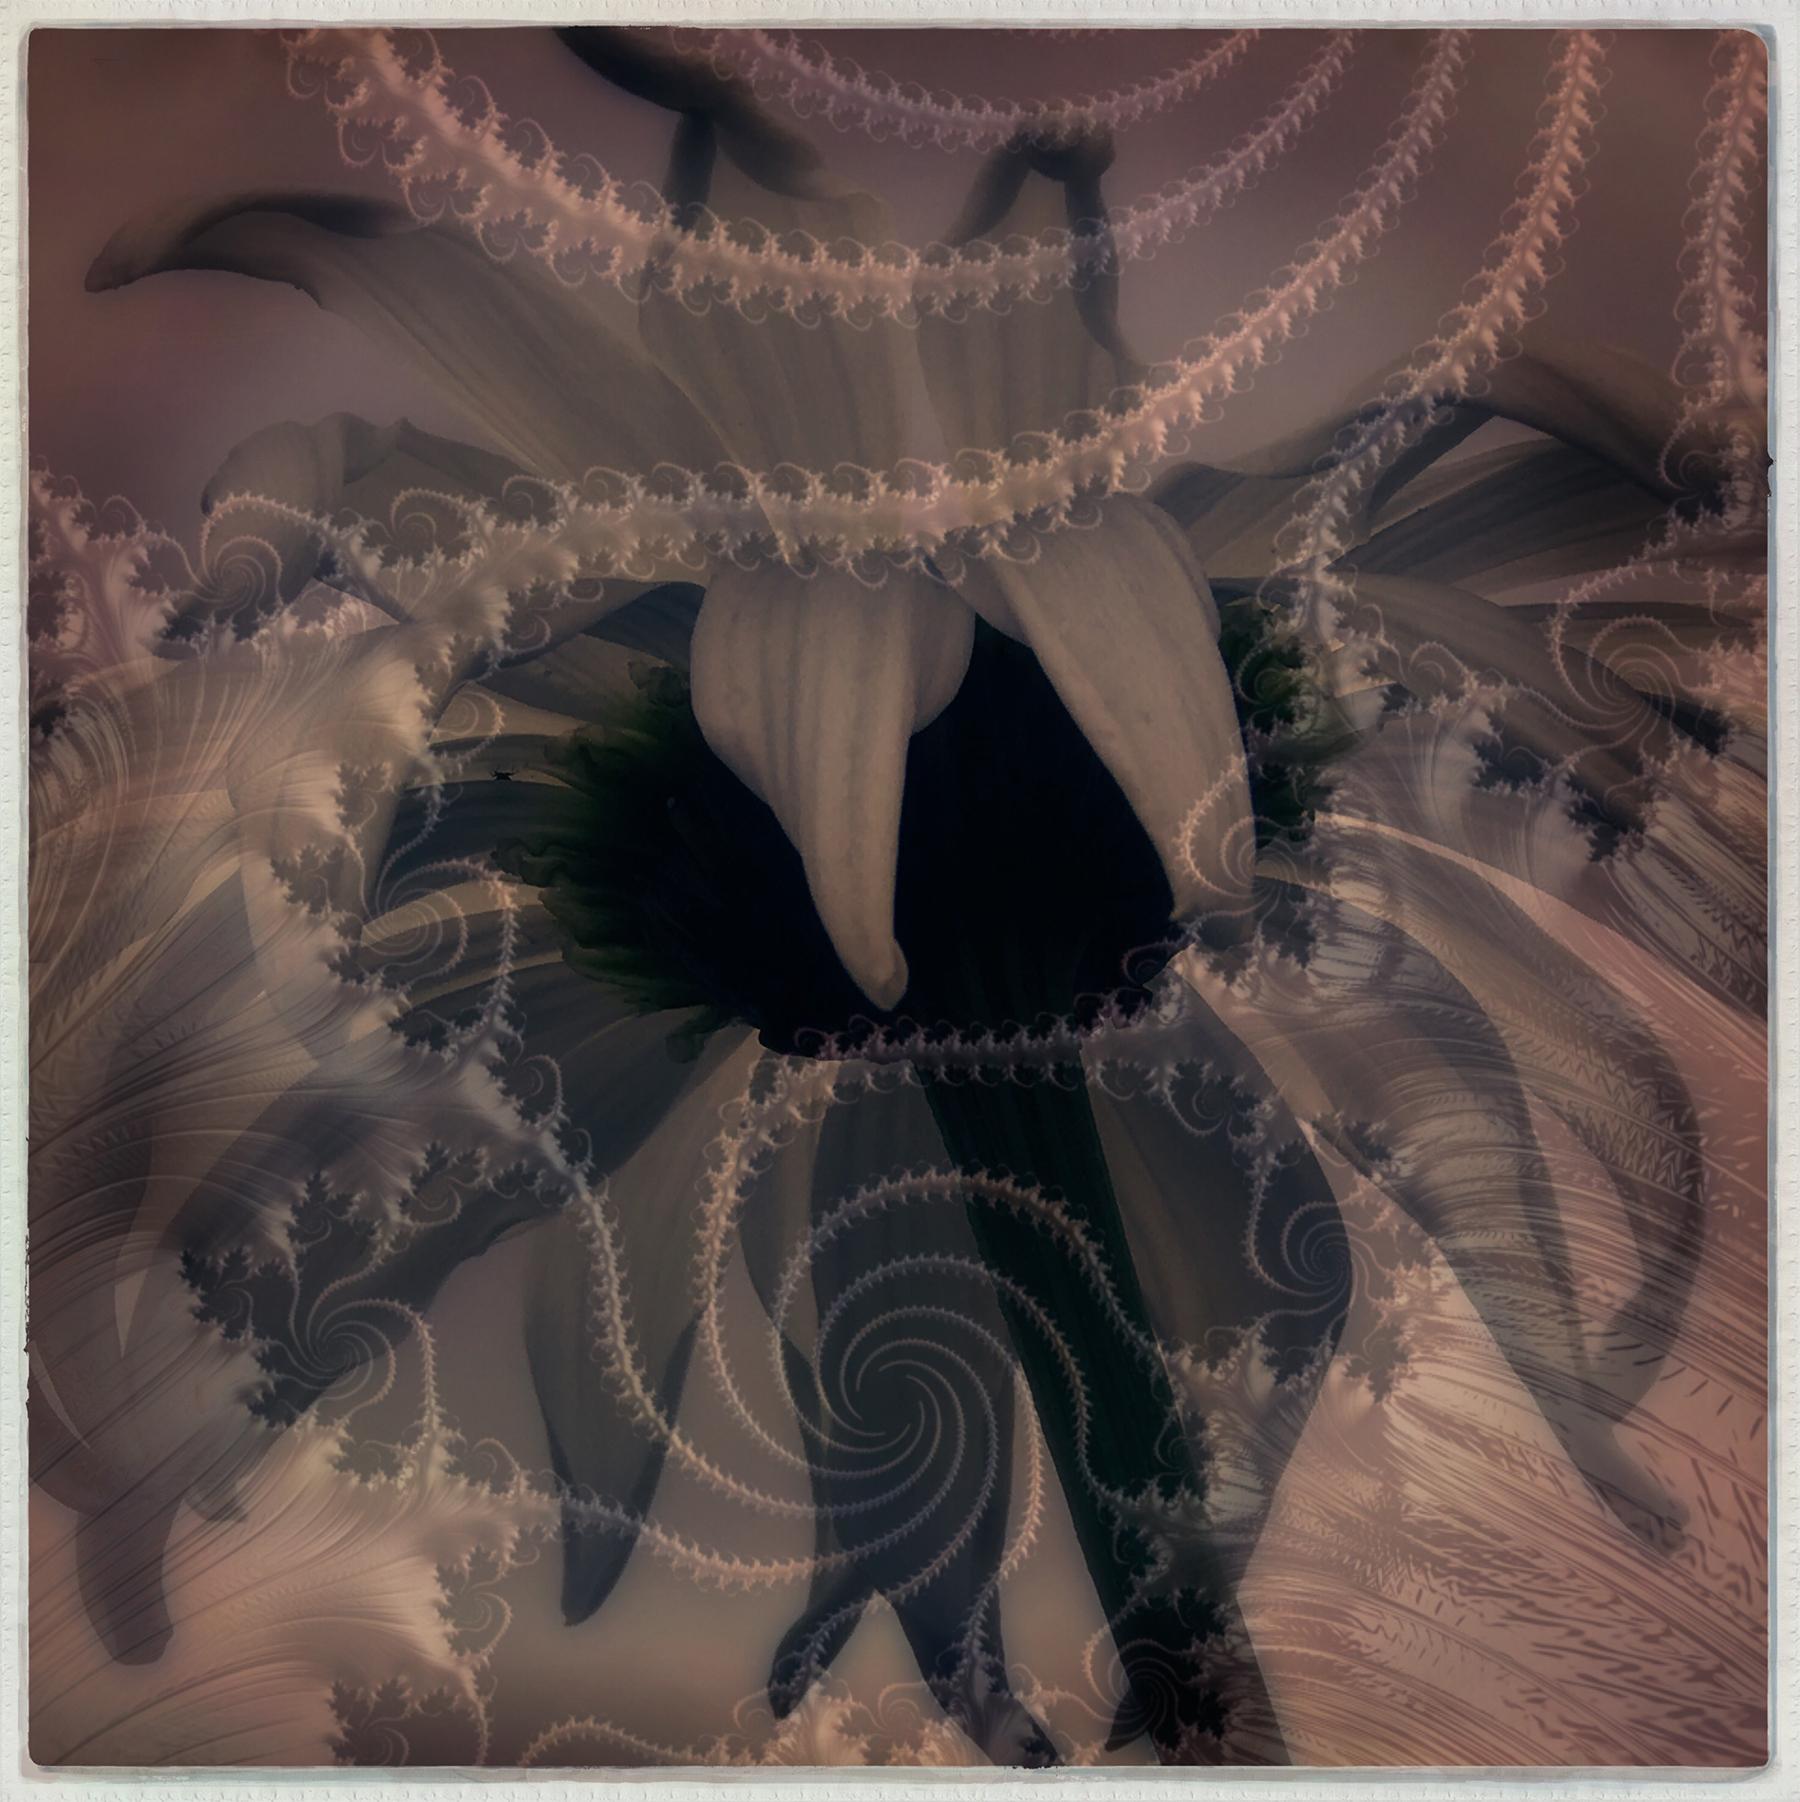 Kate_Zari Roberts_Nature Fractals_Flower Fractal_5.jpg